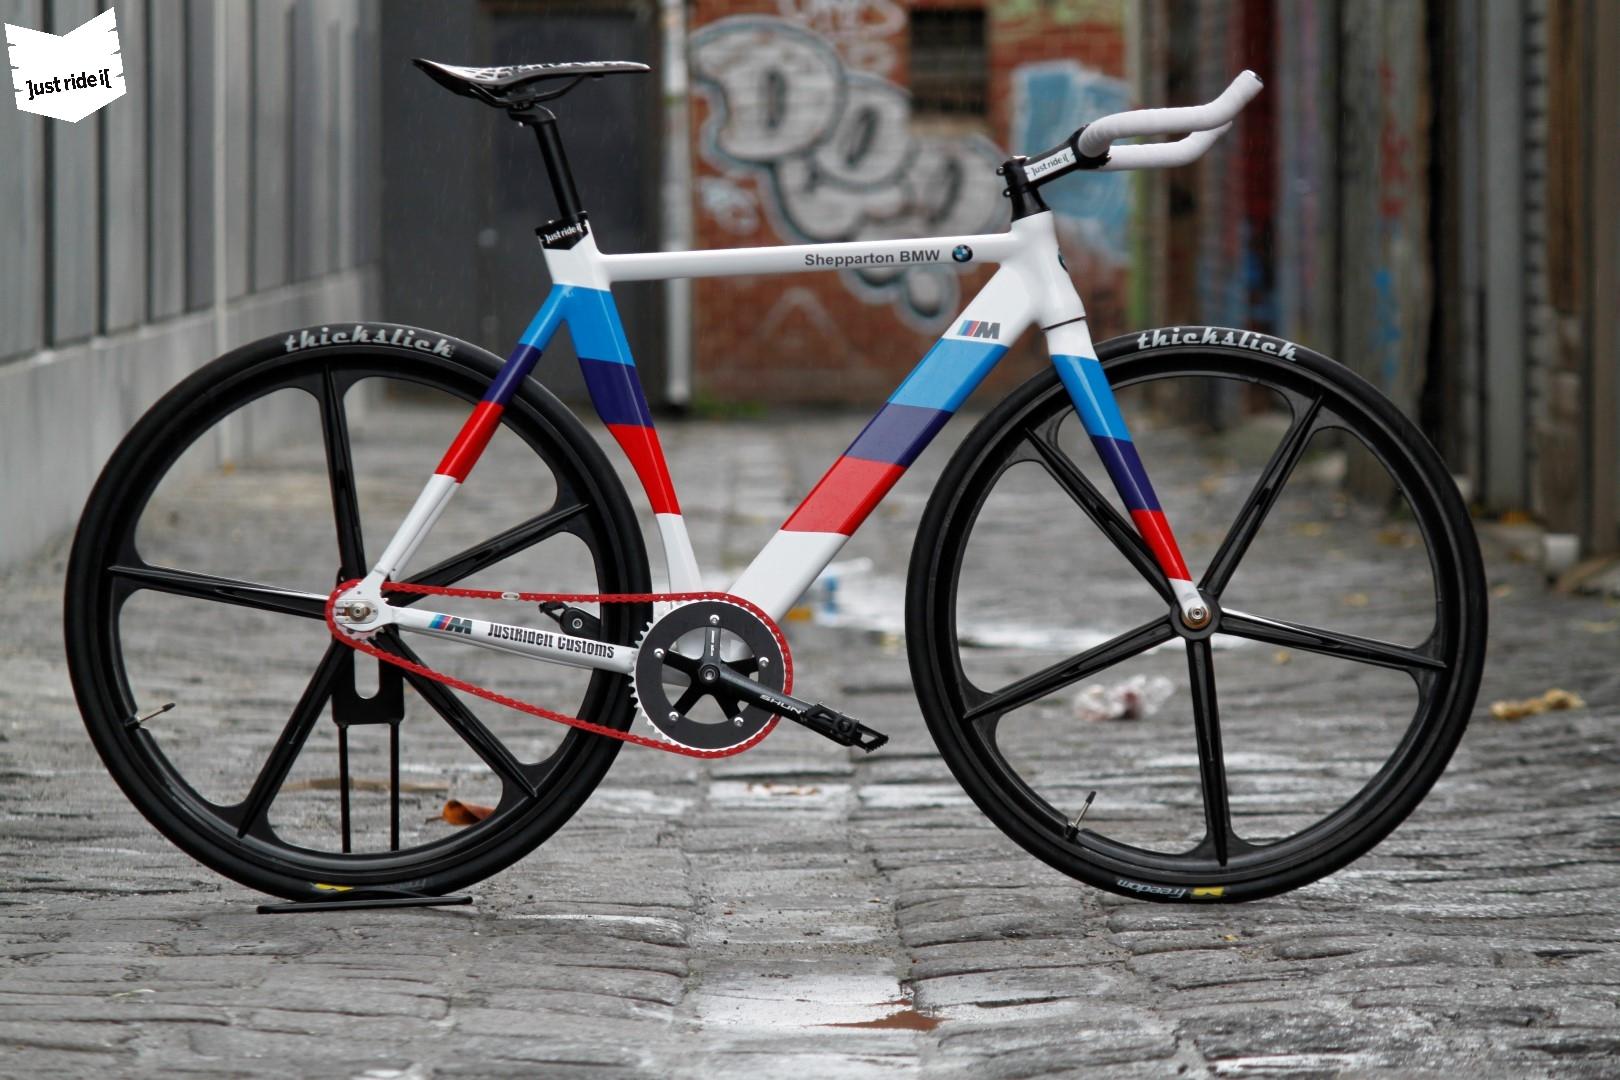 Australian Shop Creates Custom M4 Bike Autoevolution